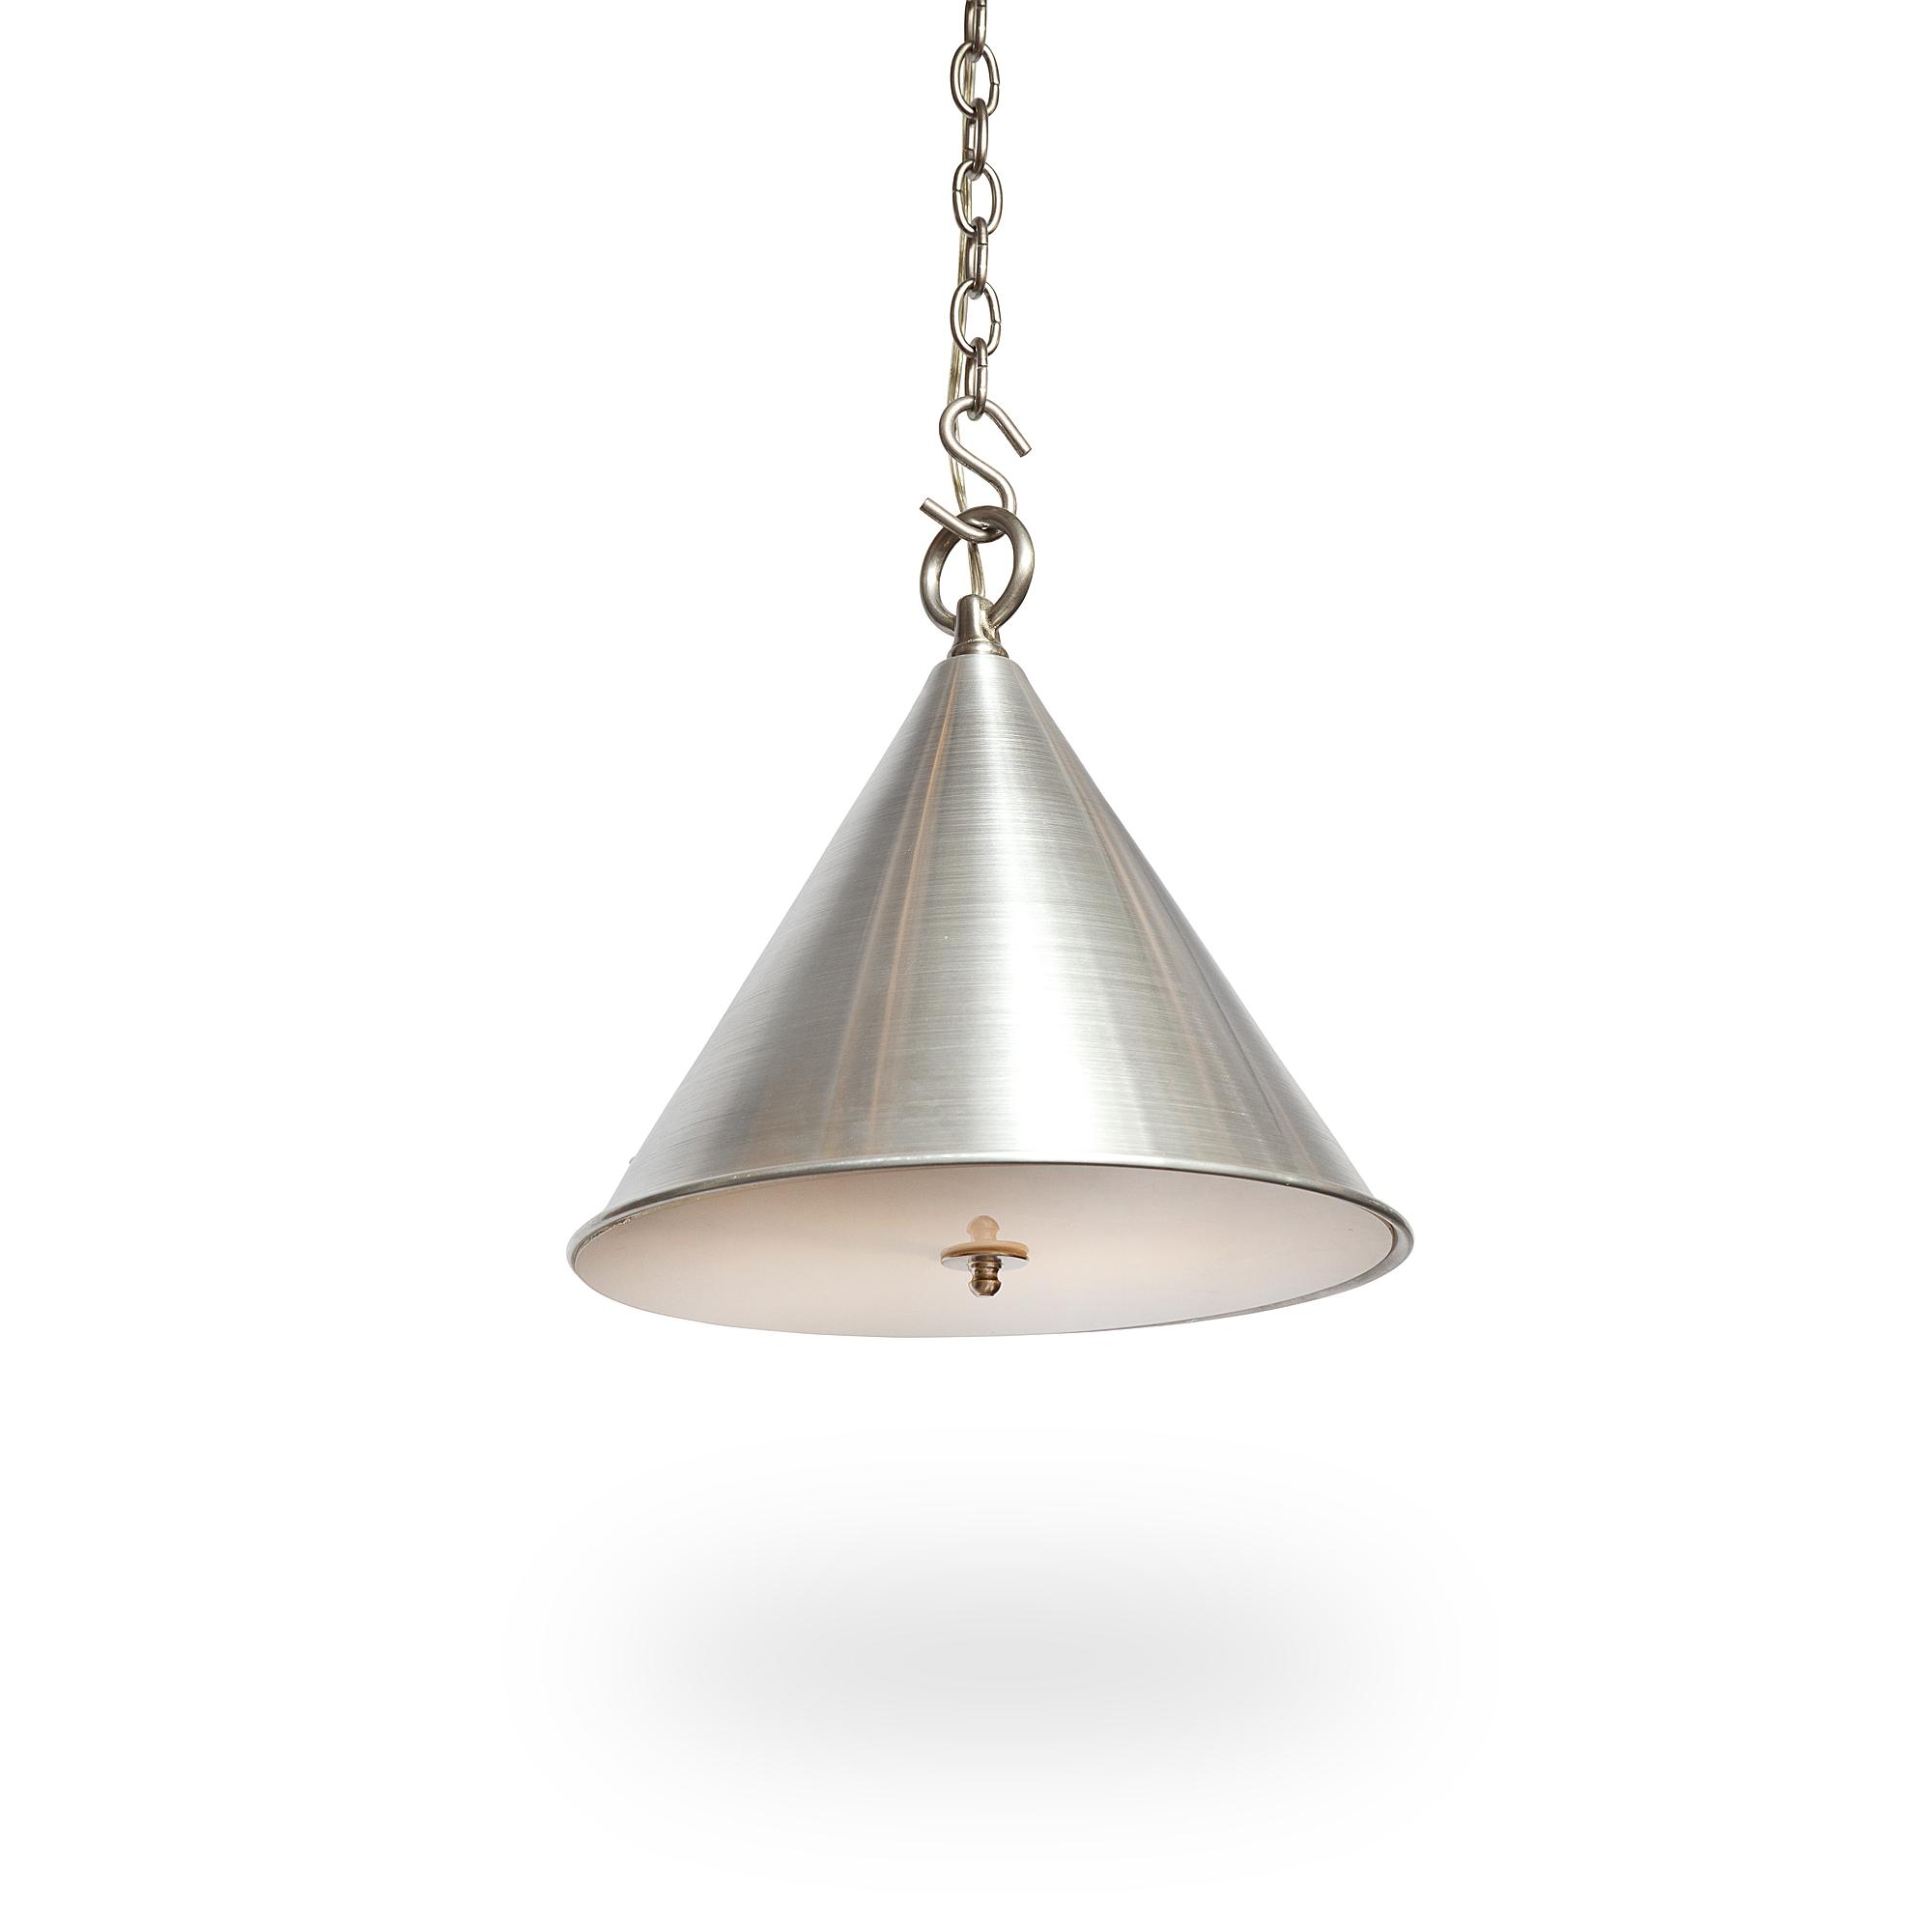 Cone Light With Diffuser